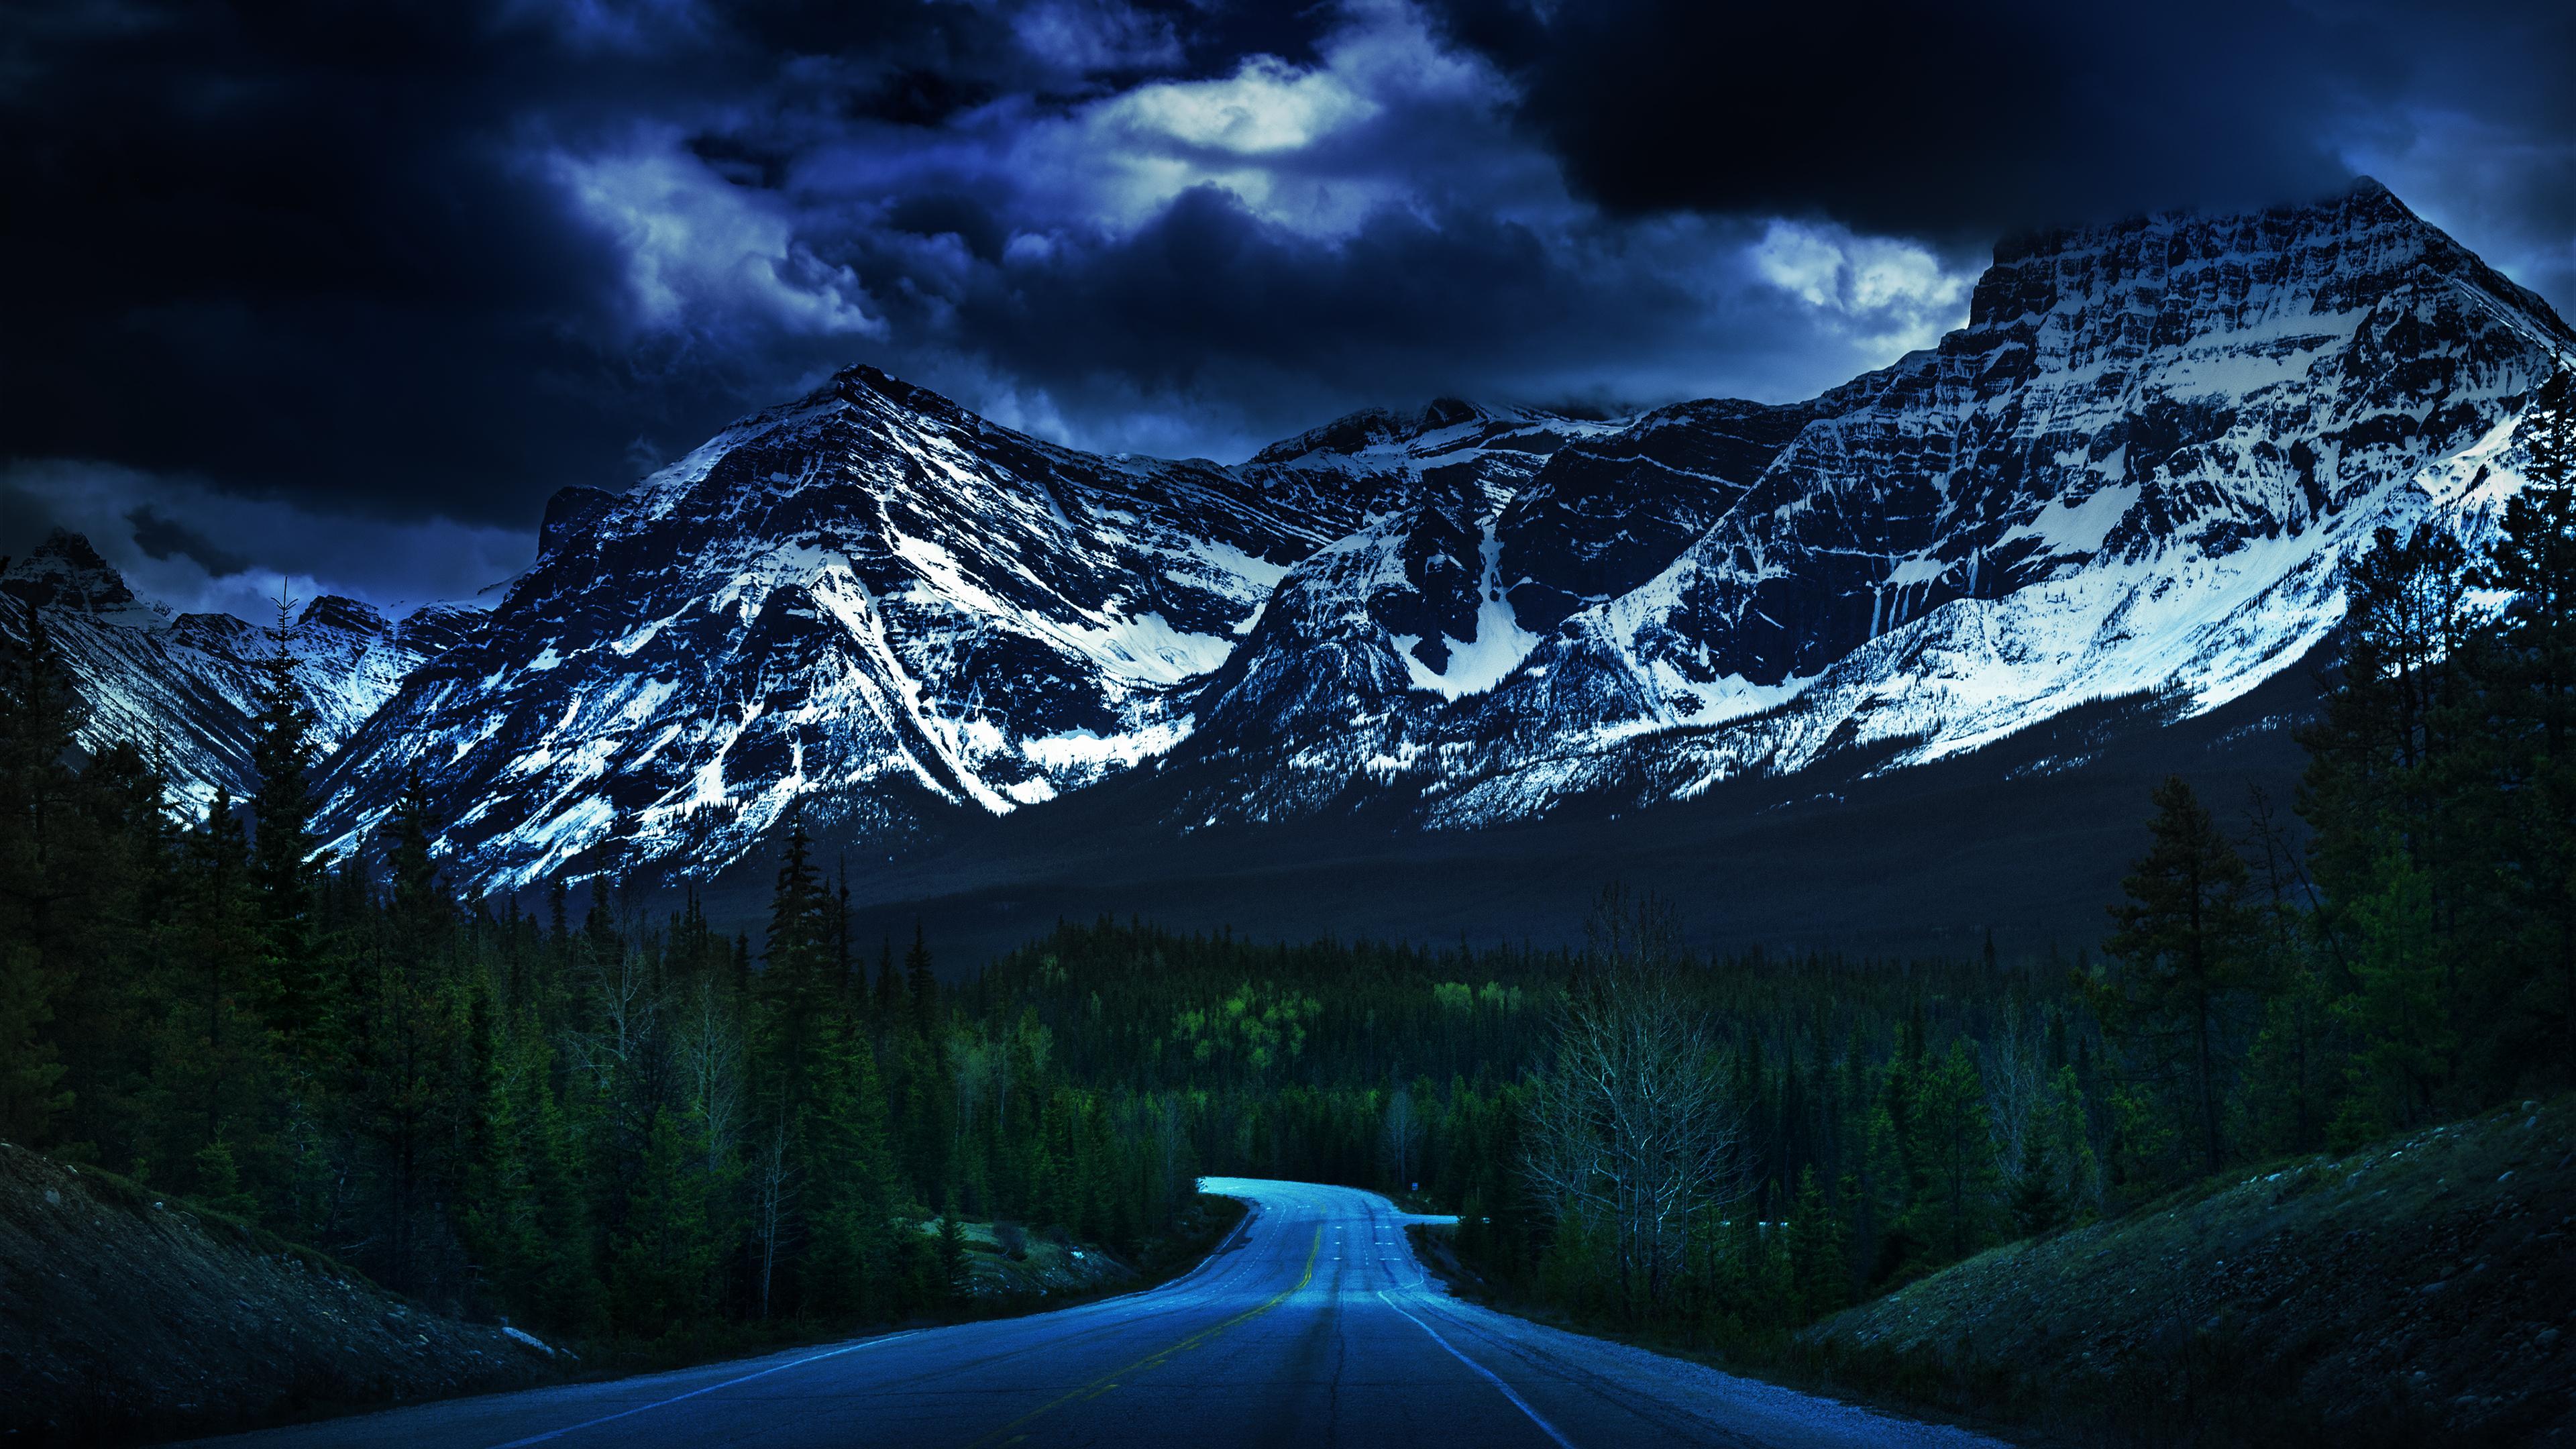 Road 4k Ultra Hd Wallpaper Background Image 3840x2160 Id